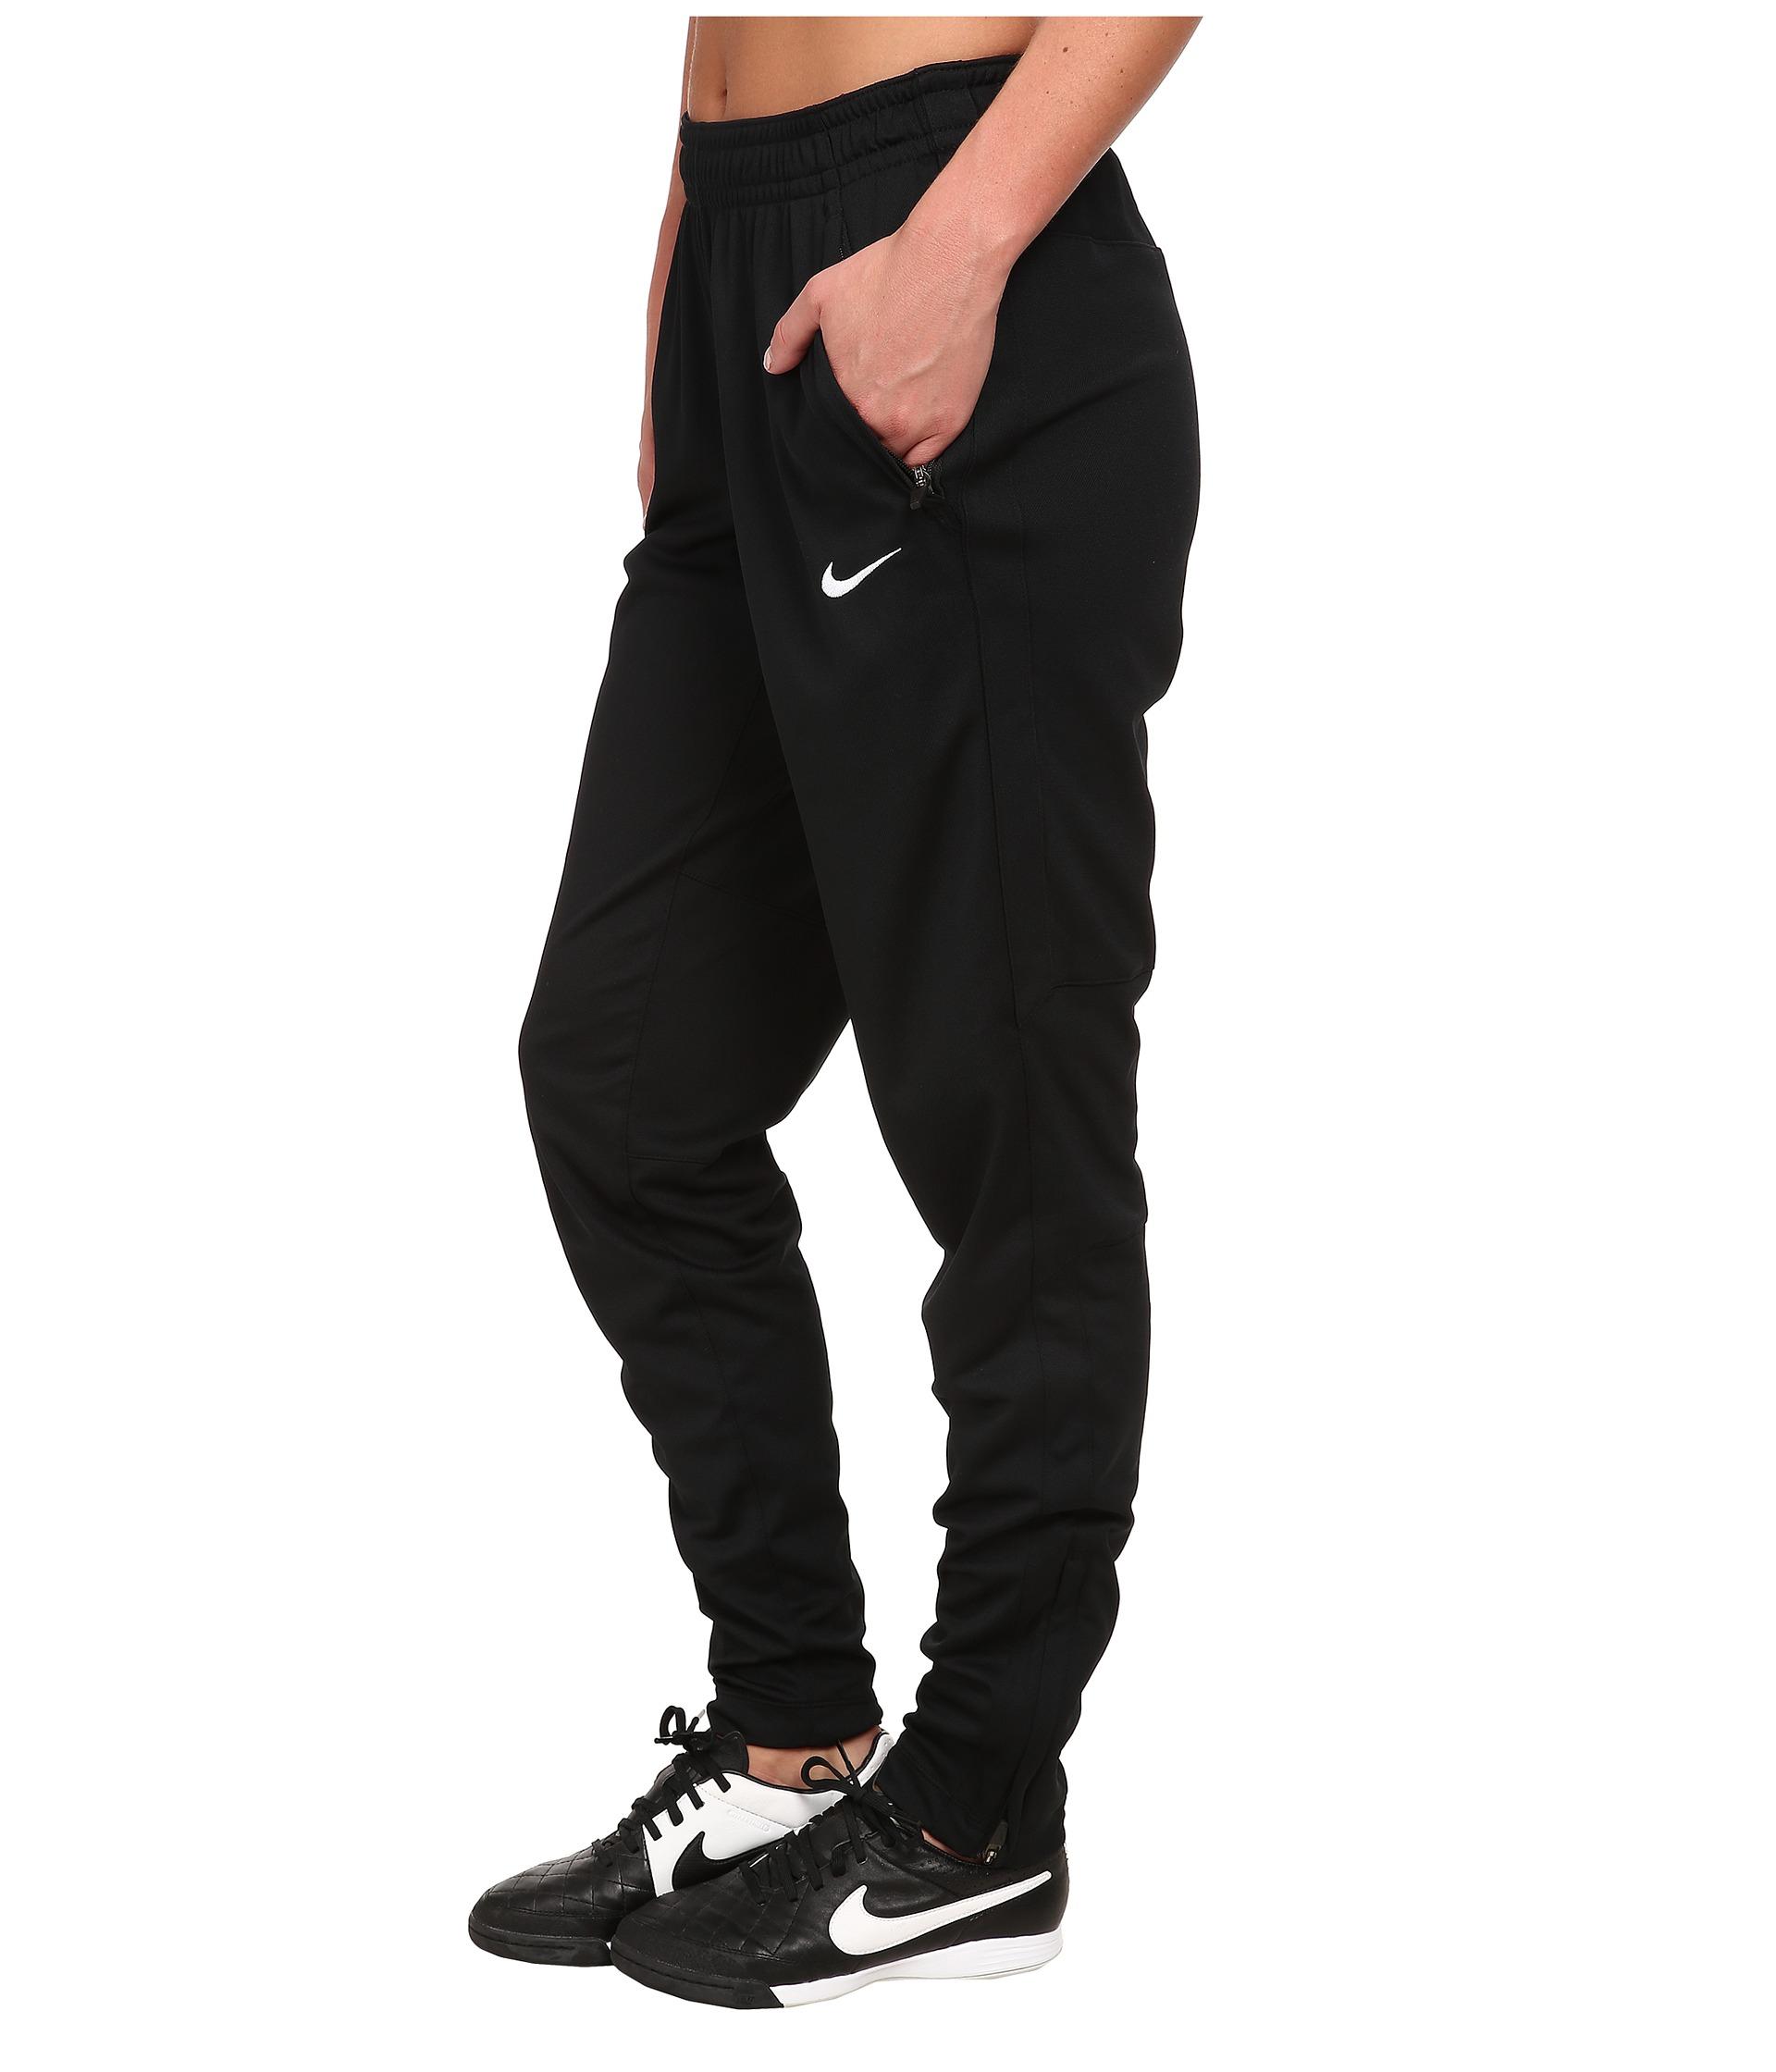 Nike Dri-fit™ Soccer Knit Pant in Black | Lyst